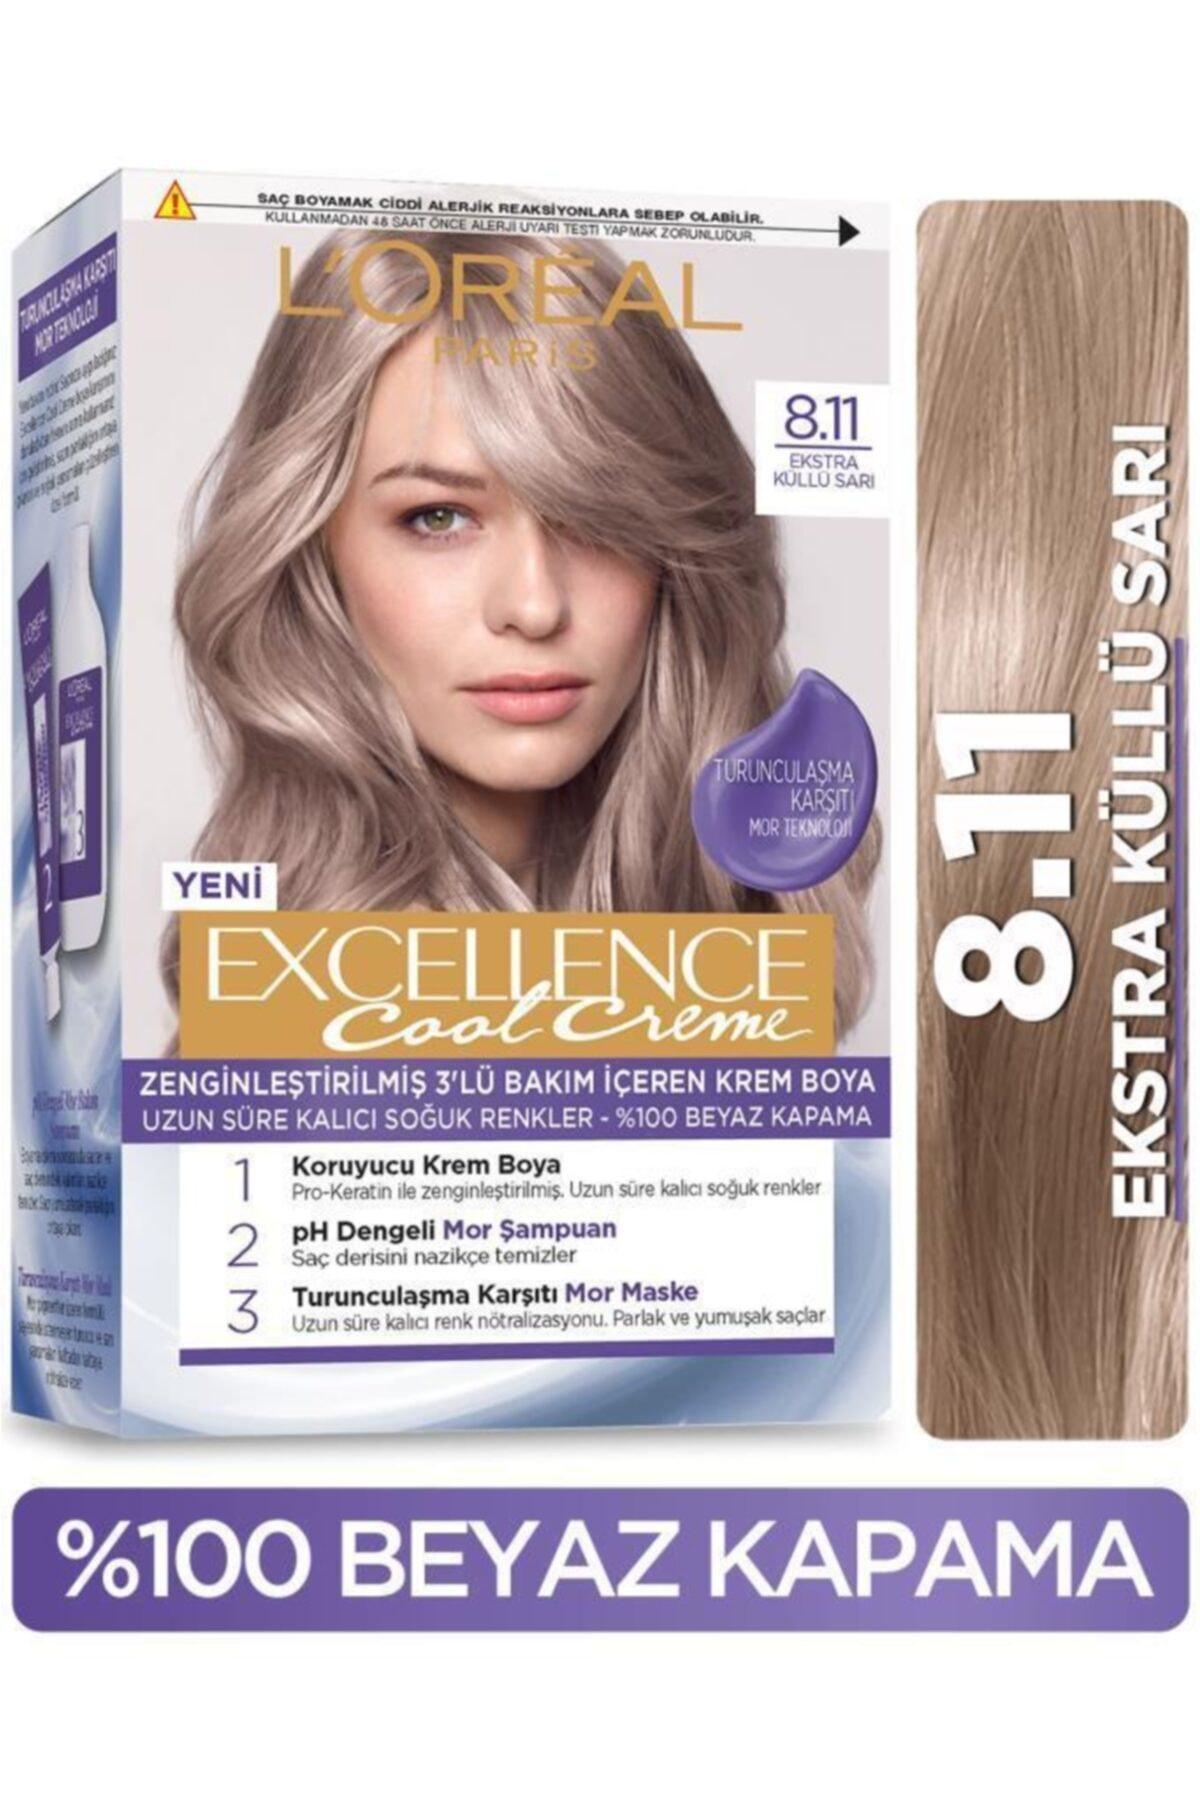 L'oréal Paris Excellence Cool Creme Saç Boyası – 8.11 Ekstra Küllü Sarı